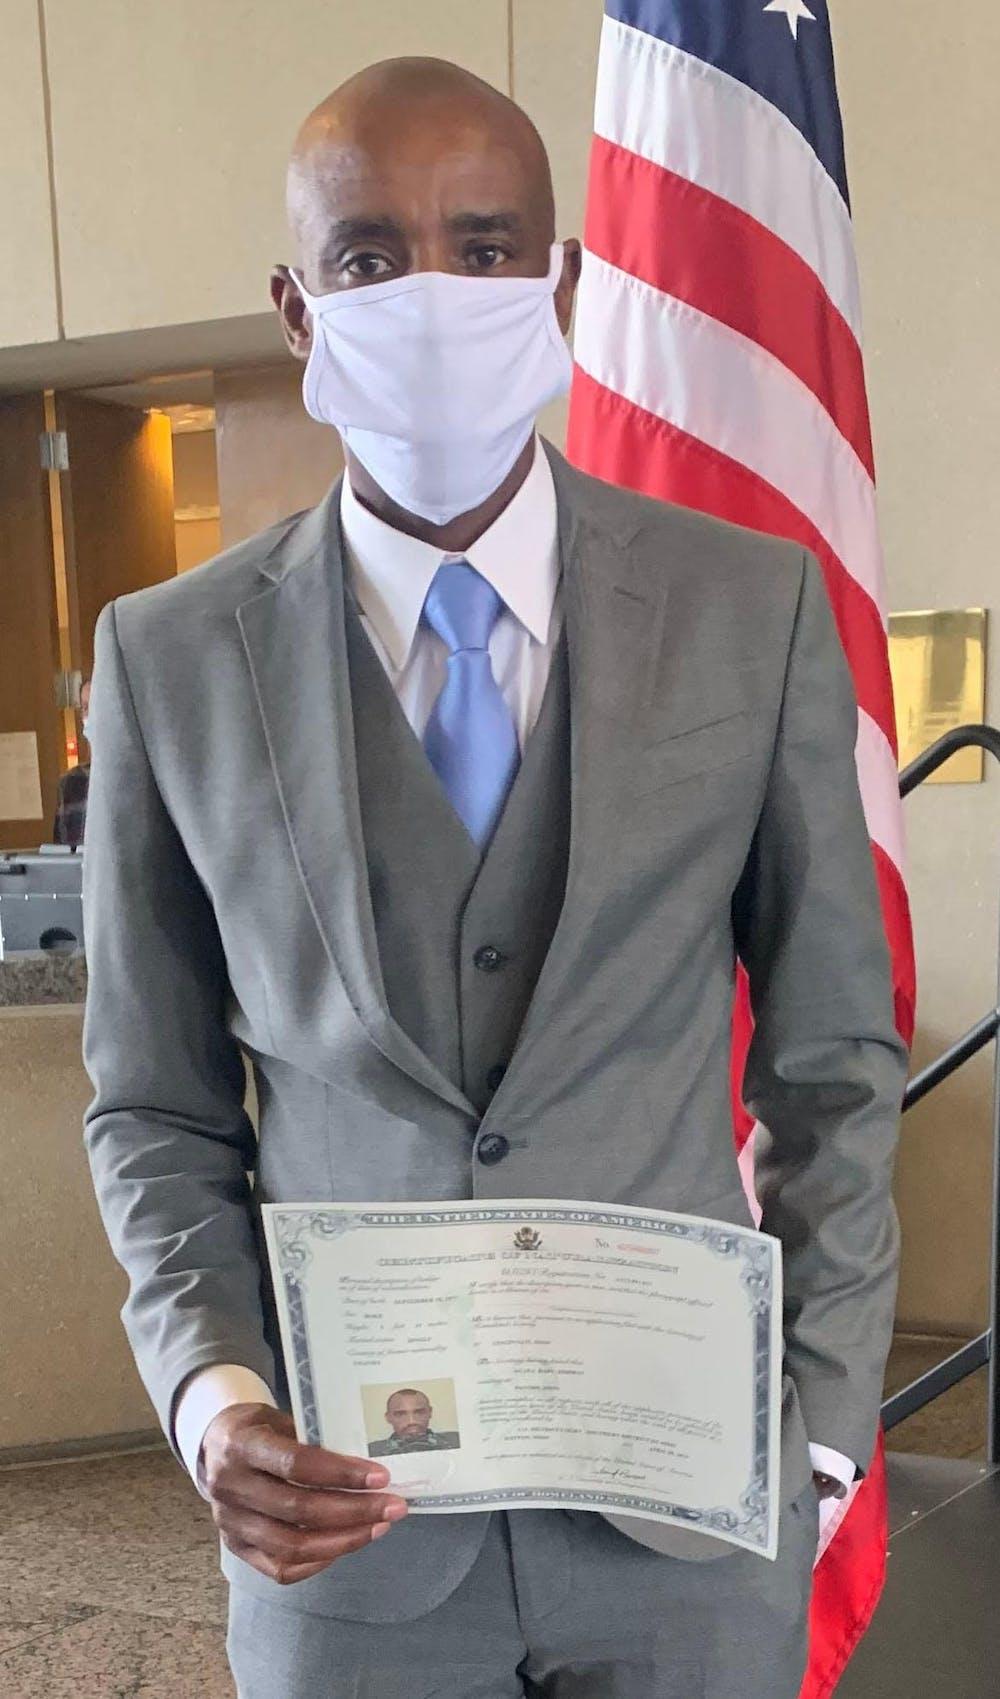 <p>Miami journalism major Godwin Agaba became an American citizen after fleeing Rwanda years ago.</p>